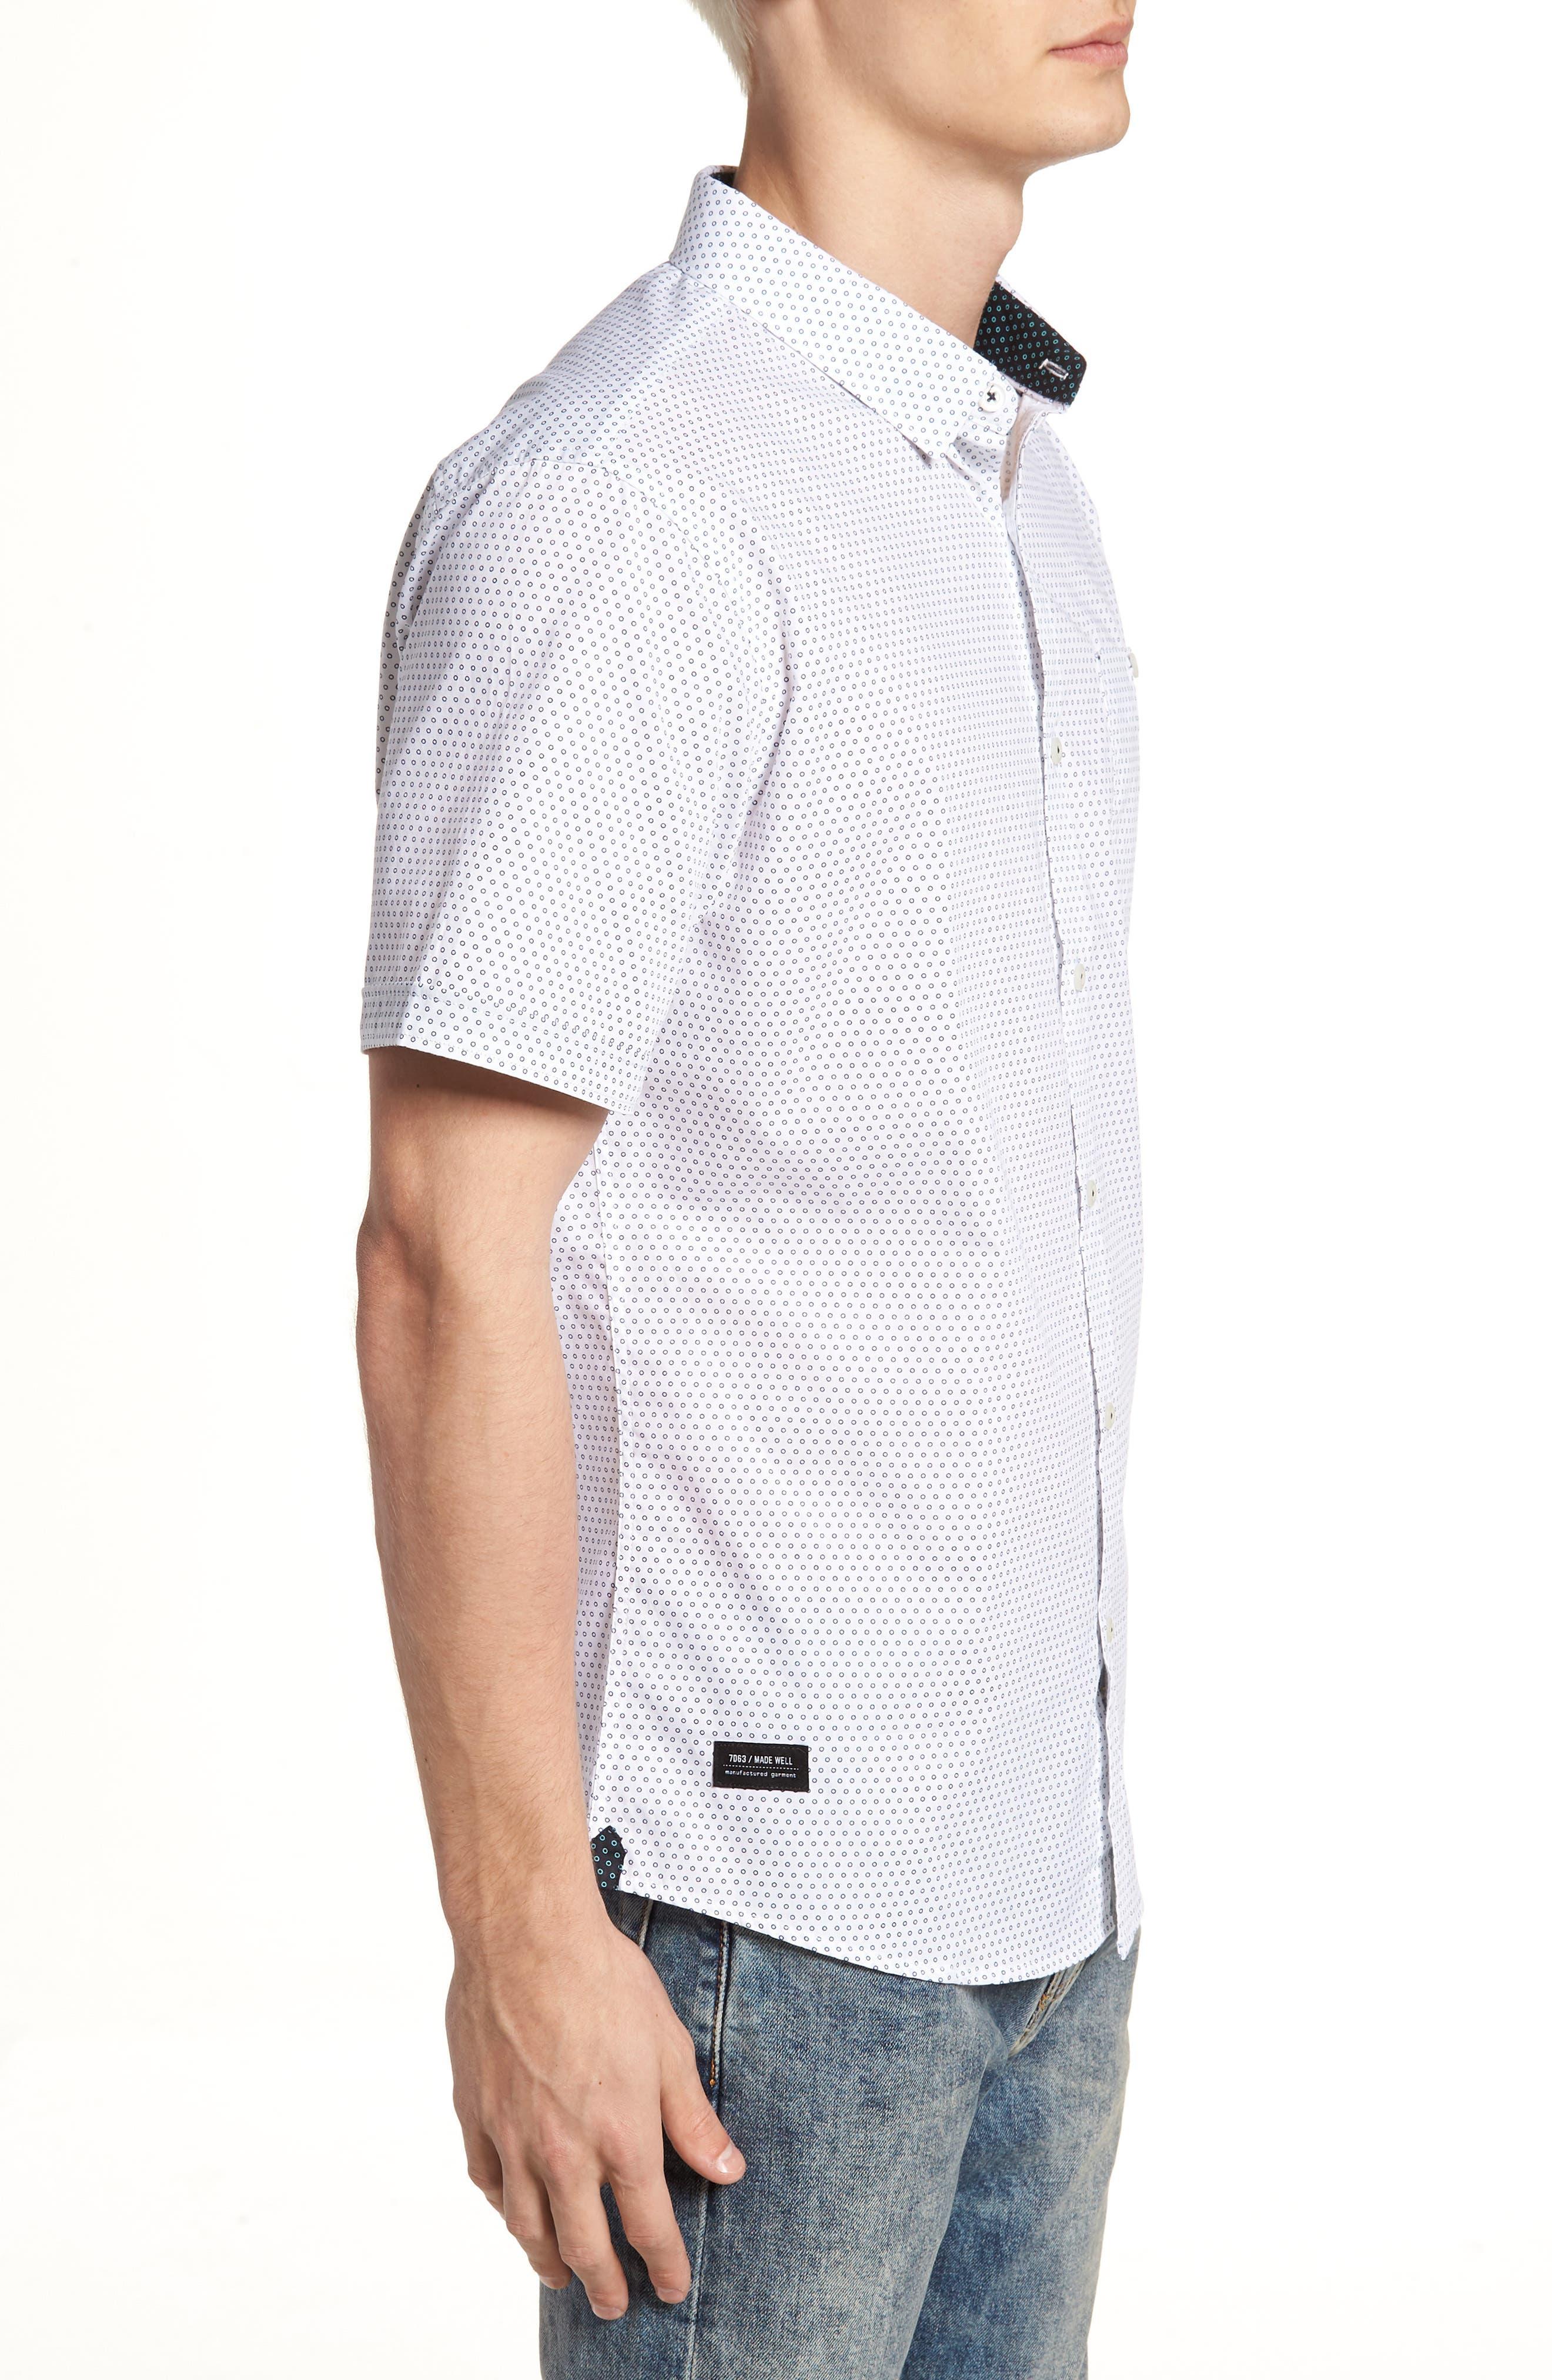 Lights of Home Slim Fit Short Sleeve Sport Shirt,                             Alternate thumbnail 3, color,                             White